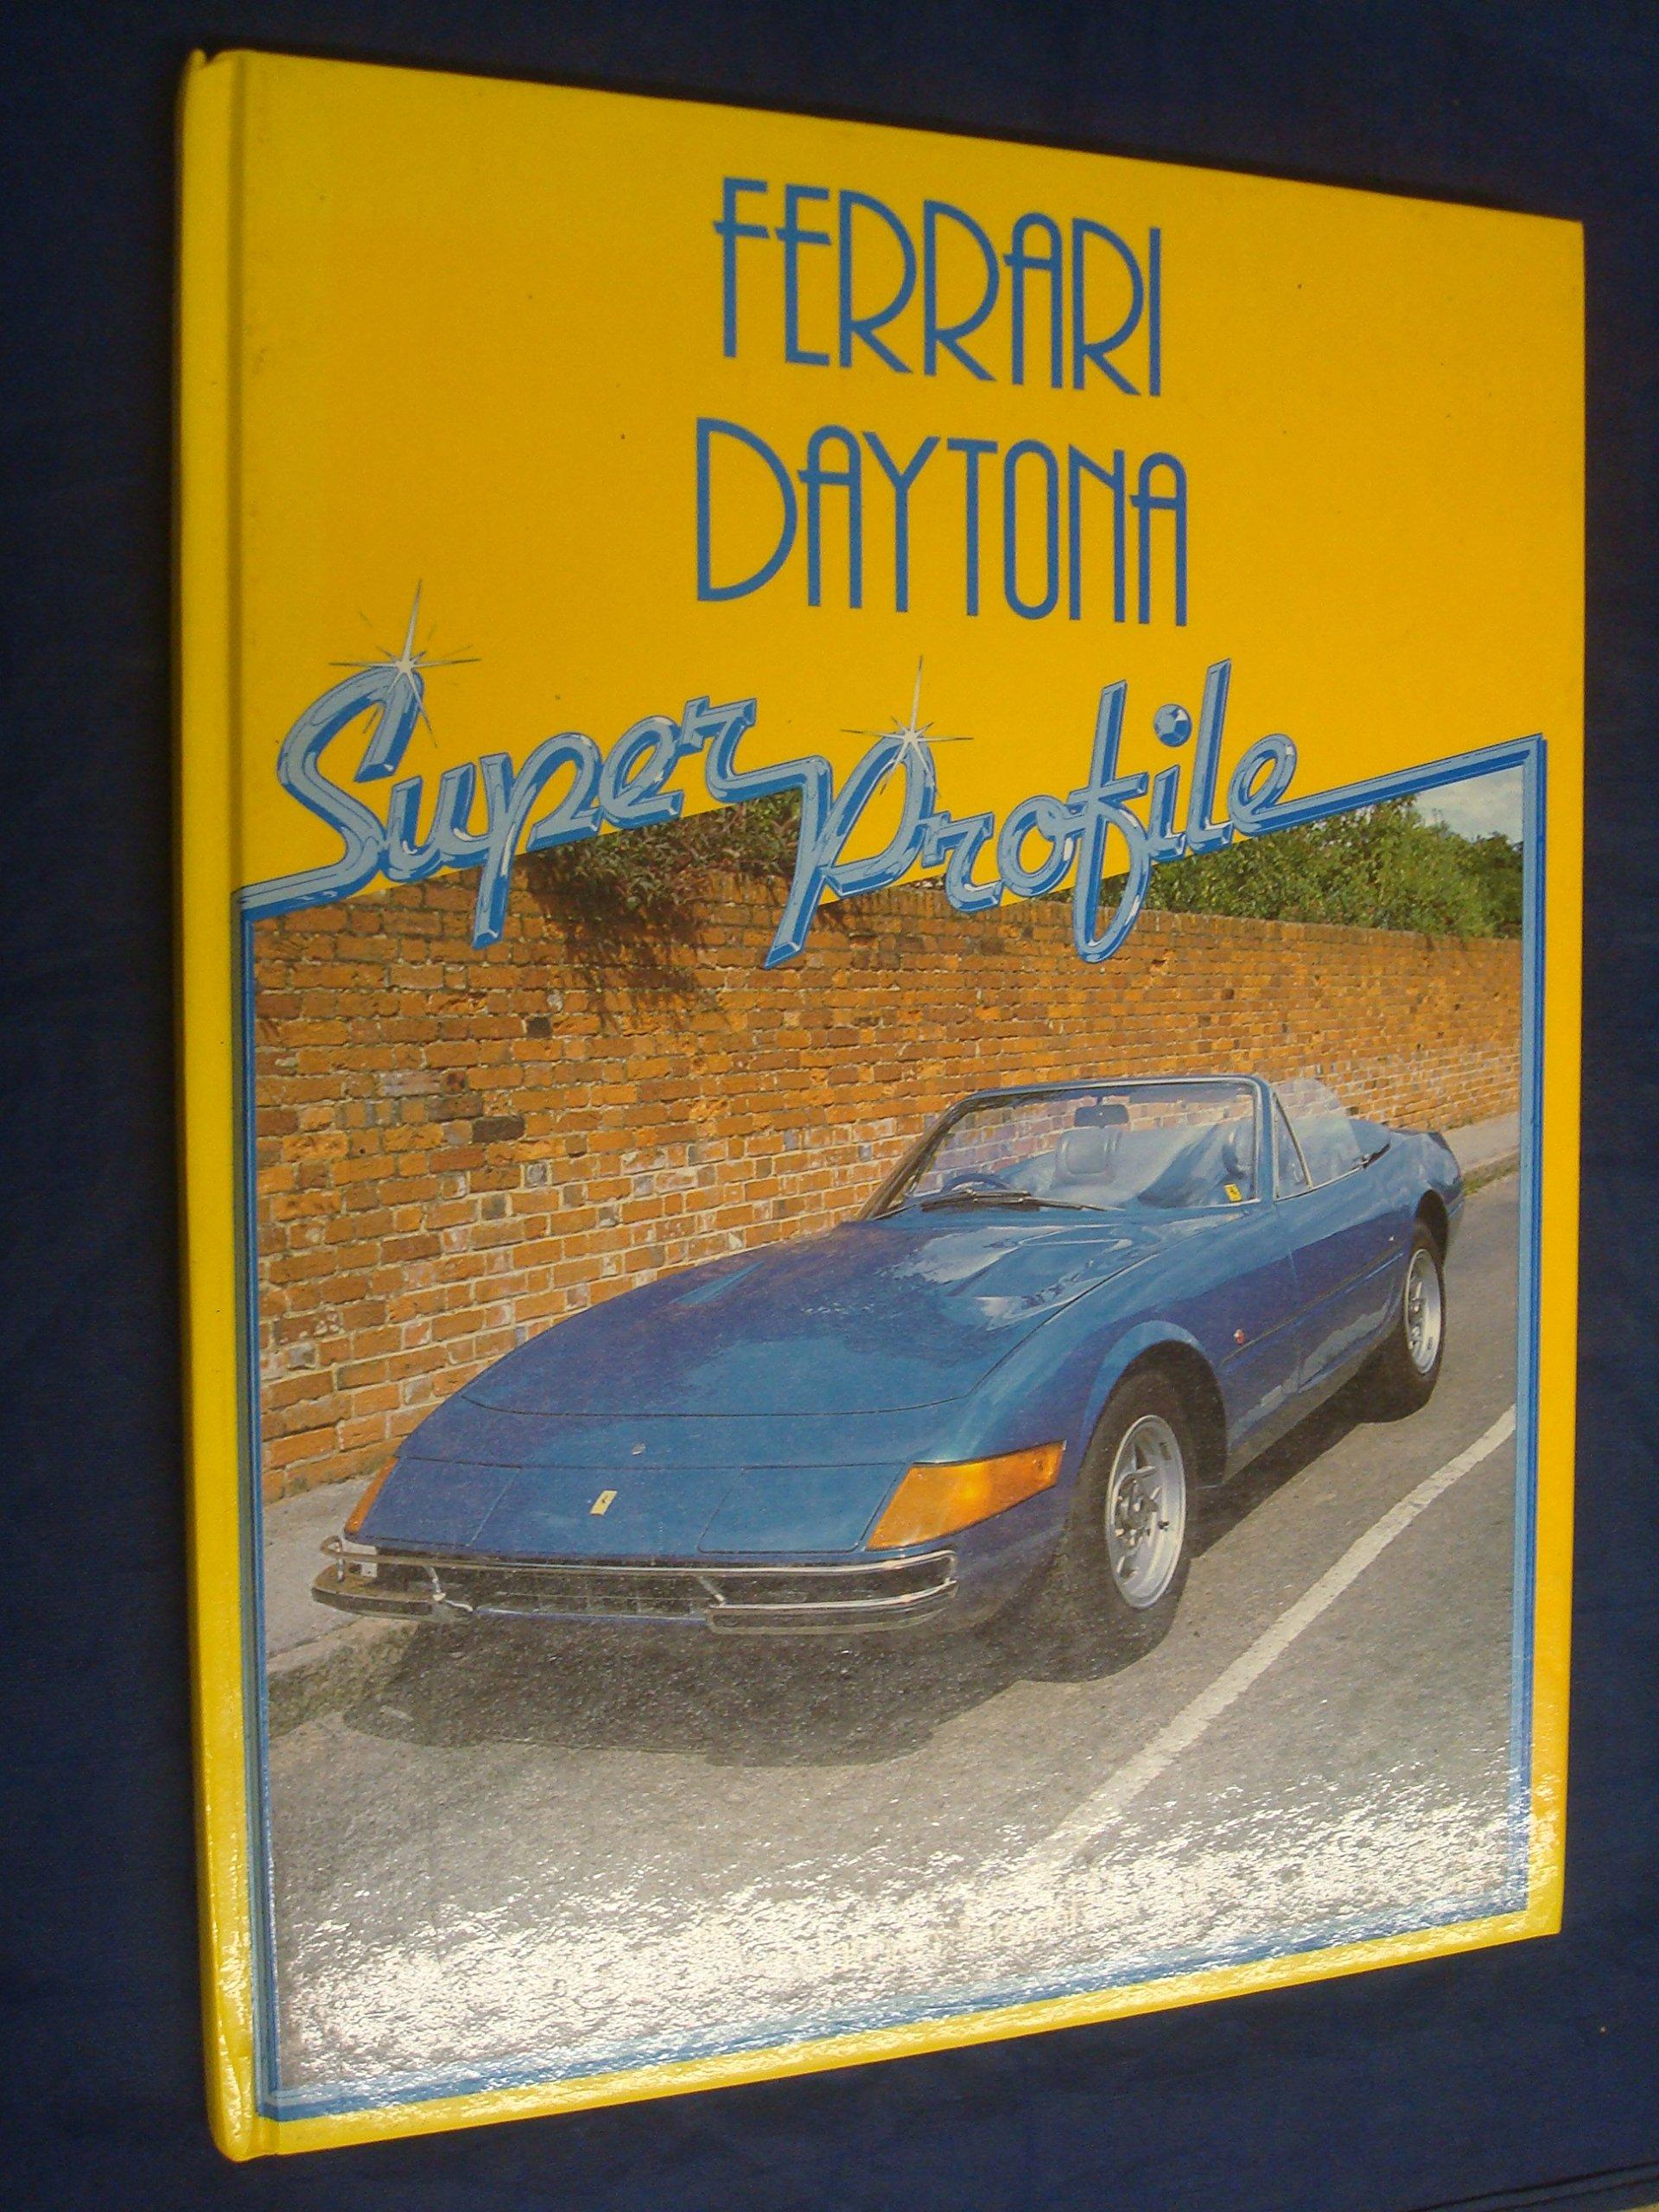 Ferrari Daytona (Super Profile)